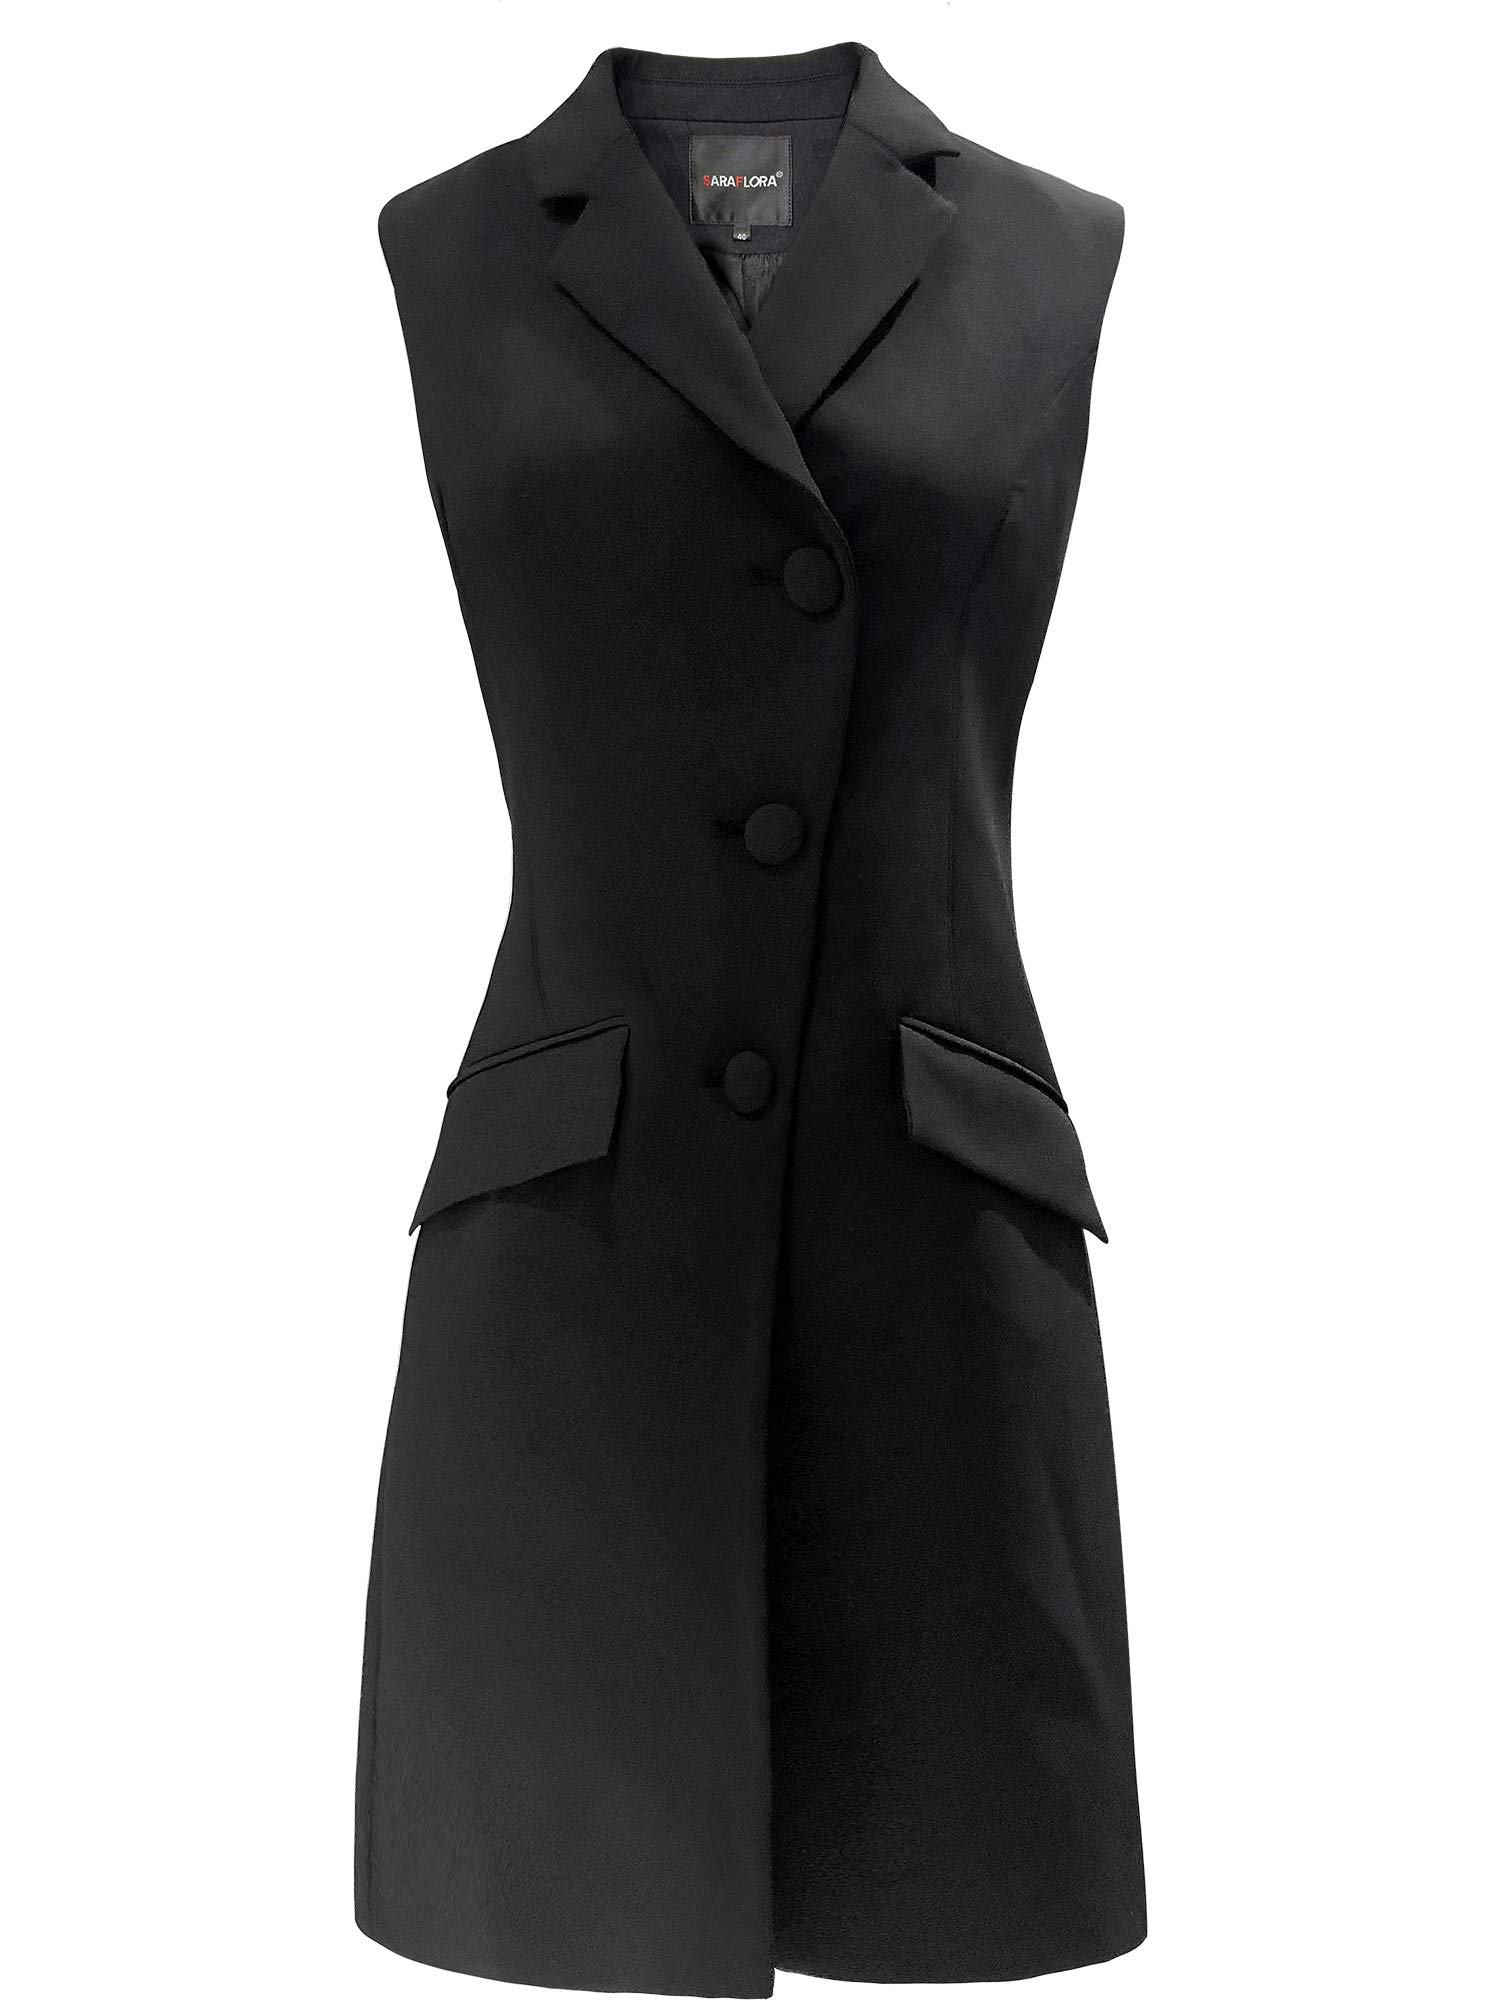 SARAFLORA Women's Sleeveless Long Trench Vest Casual Lapel Blazer Jacket with Pockets Long Suit Coat Waistcoat Black